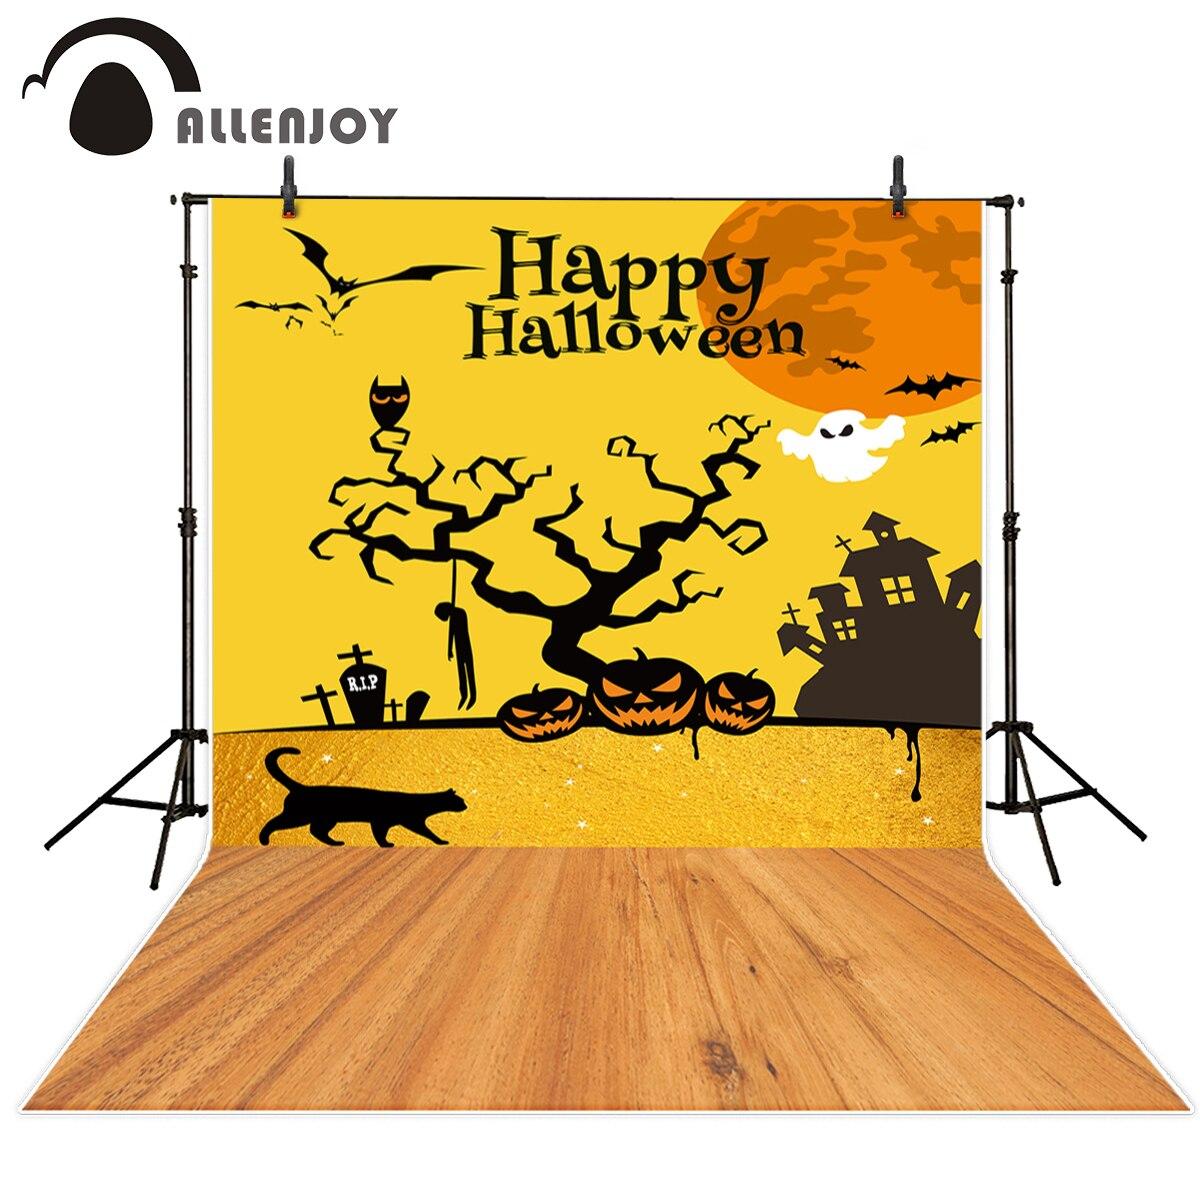 Allenjoy photo background Halloween Ghost pumpkin tree castle cat scary tomb moon wood floor the cloth vinyl backdrops